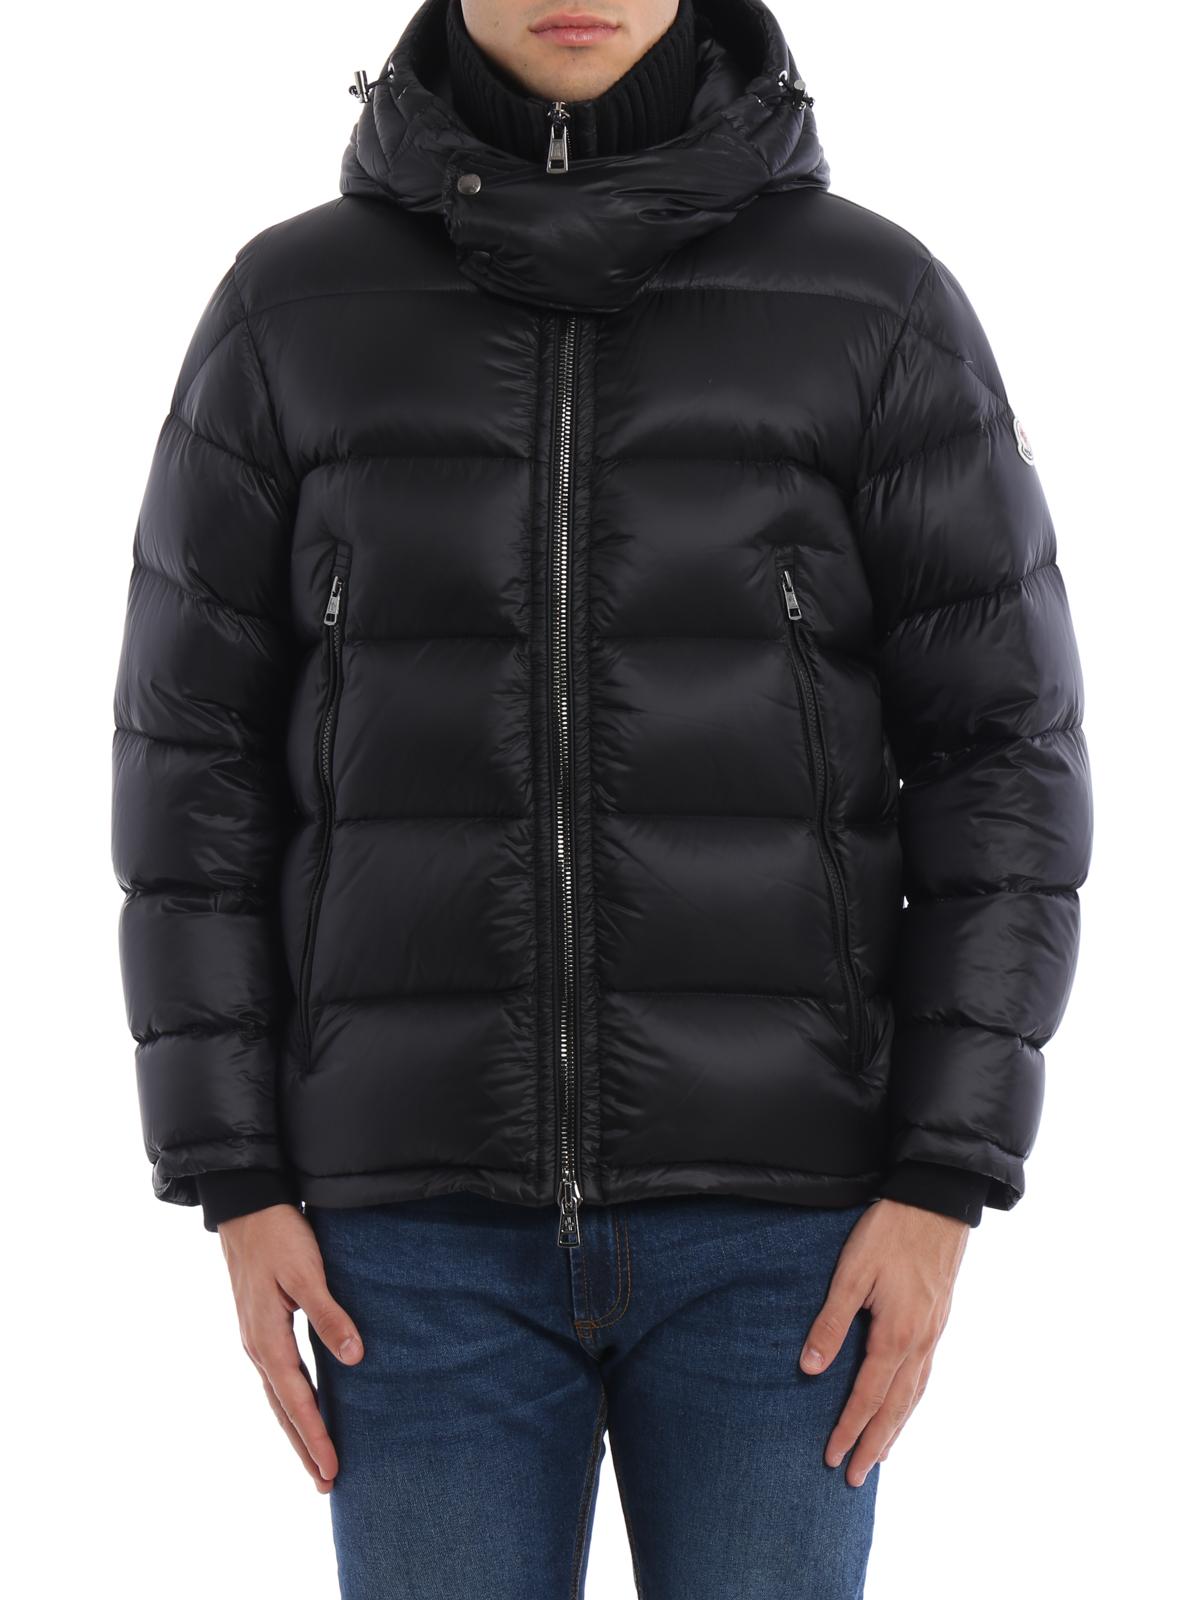 01d9fcdeb Moncler - Pascal padded jacket - padded jackets - C2 091 4193605 ...